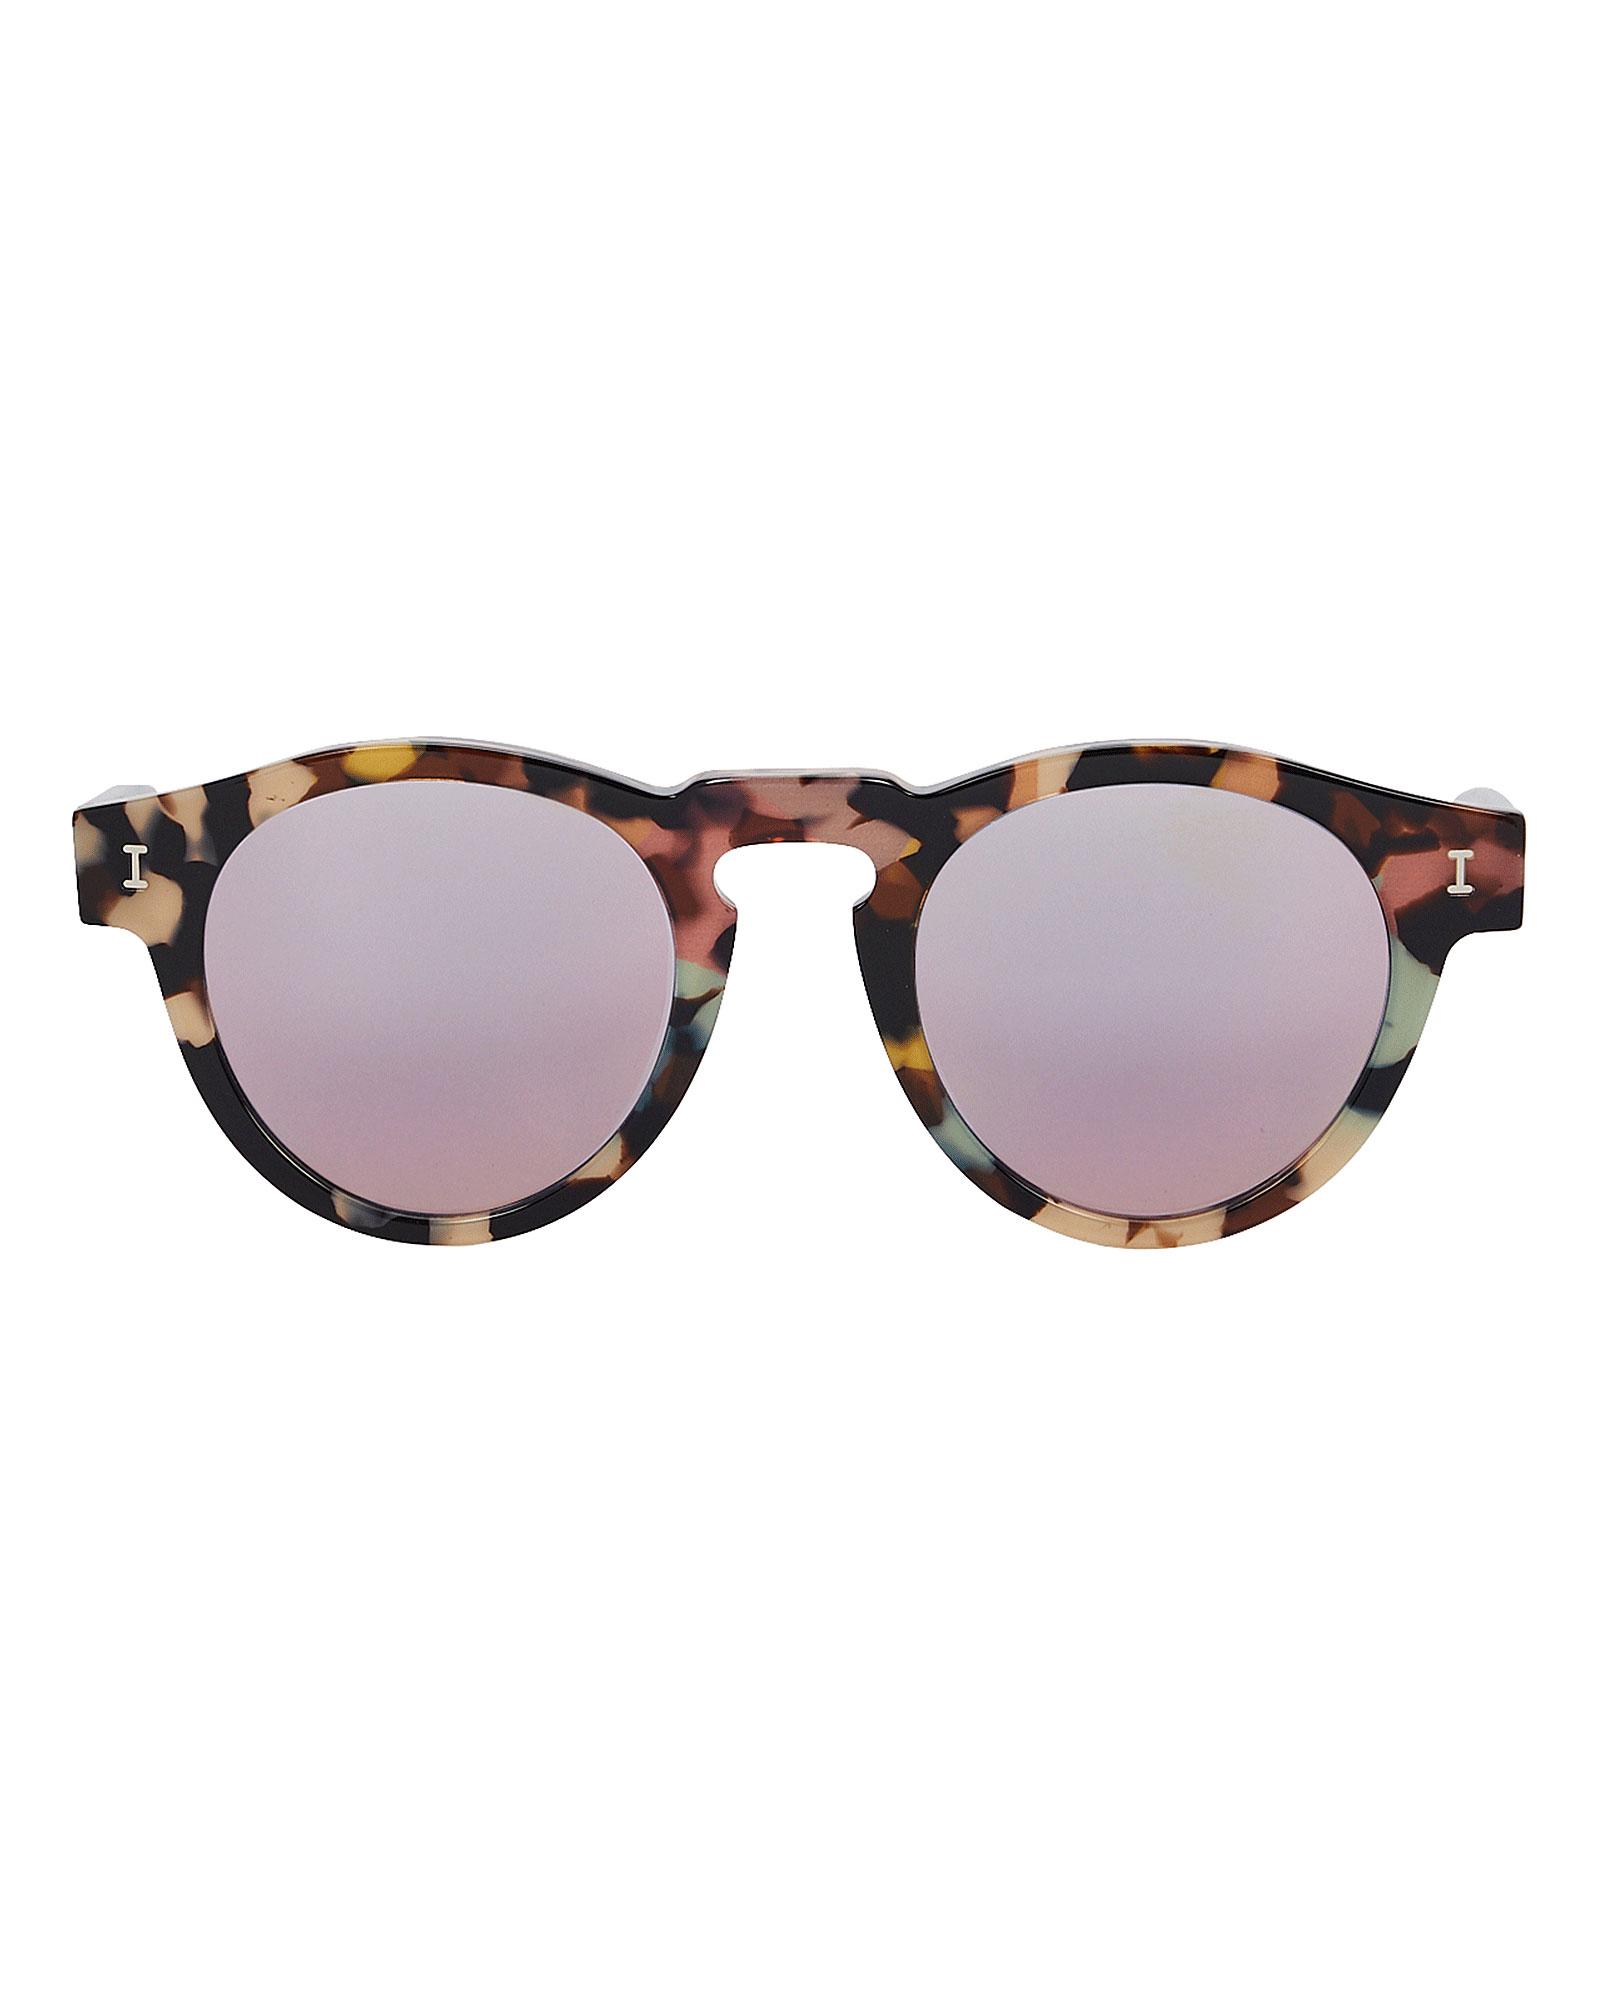 Illesteva Sunglasses ILLESTEVA LEONARD ROUNDED MIRROR SUNGLASSES